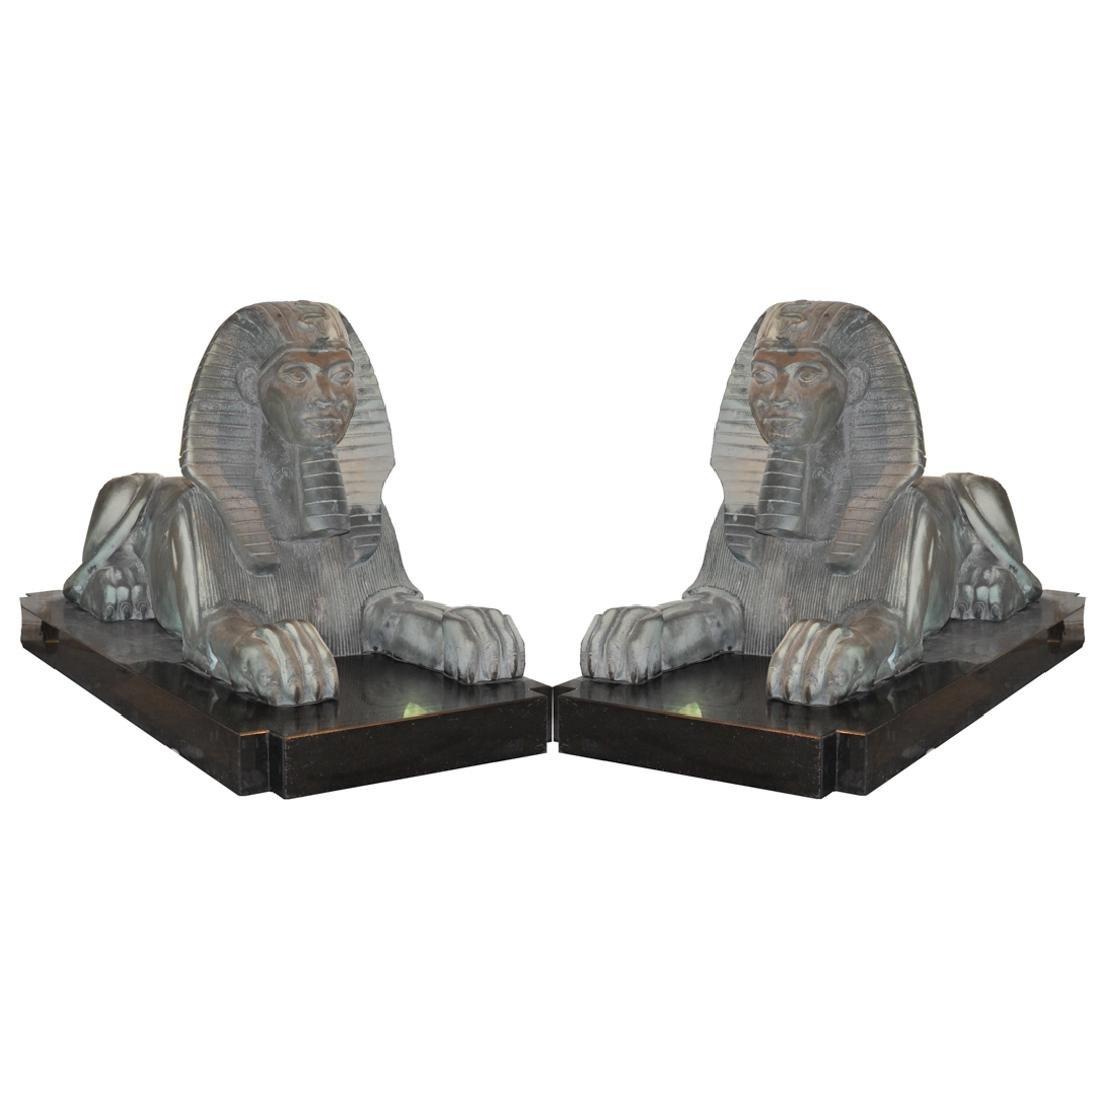 Pair of Emil Epple (German, 1877-1955) Cast Iron Sphinx